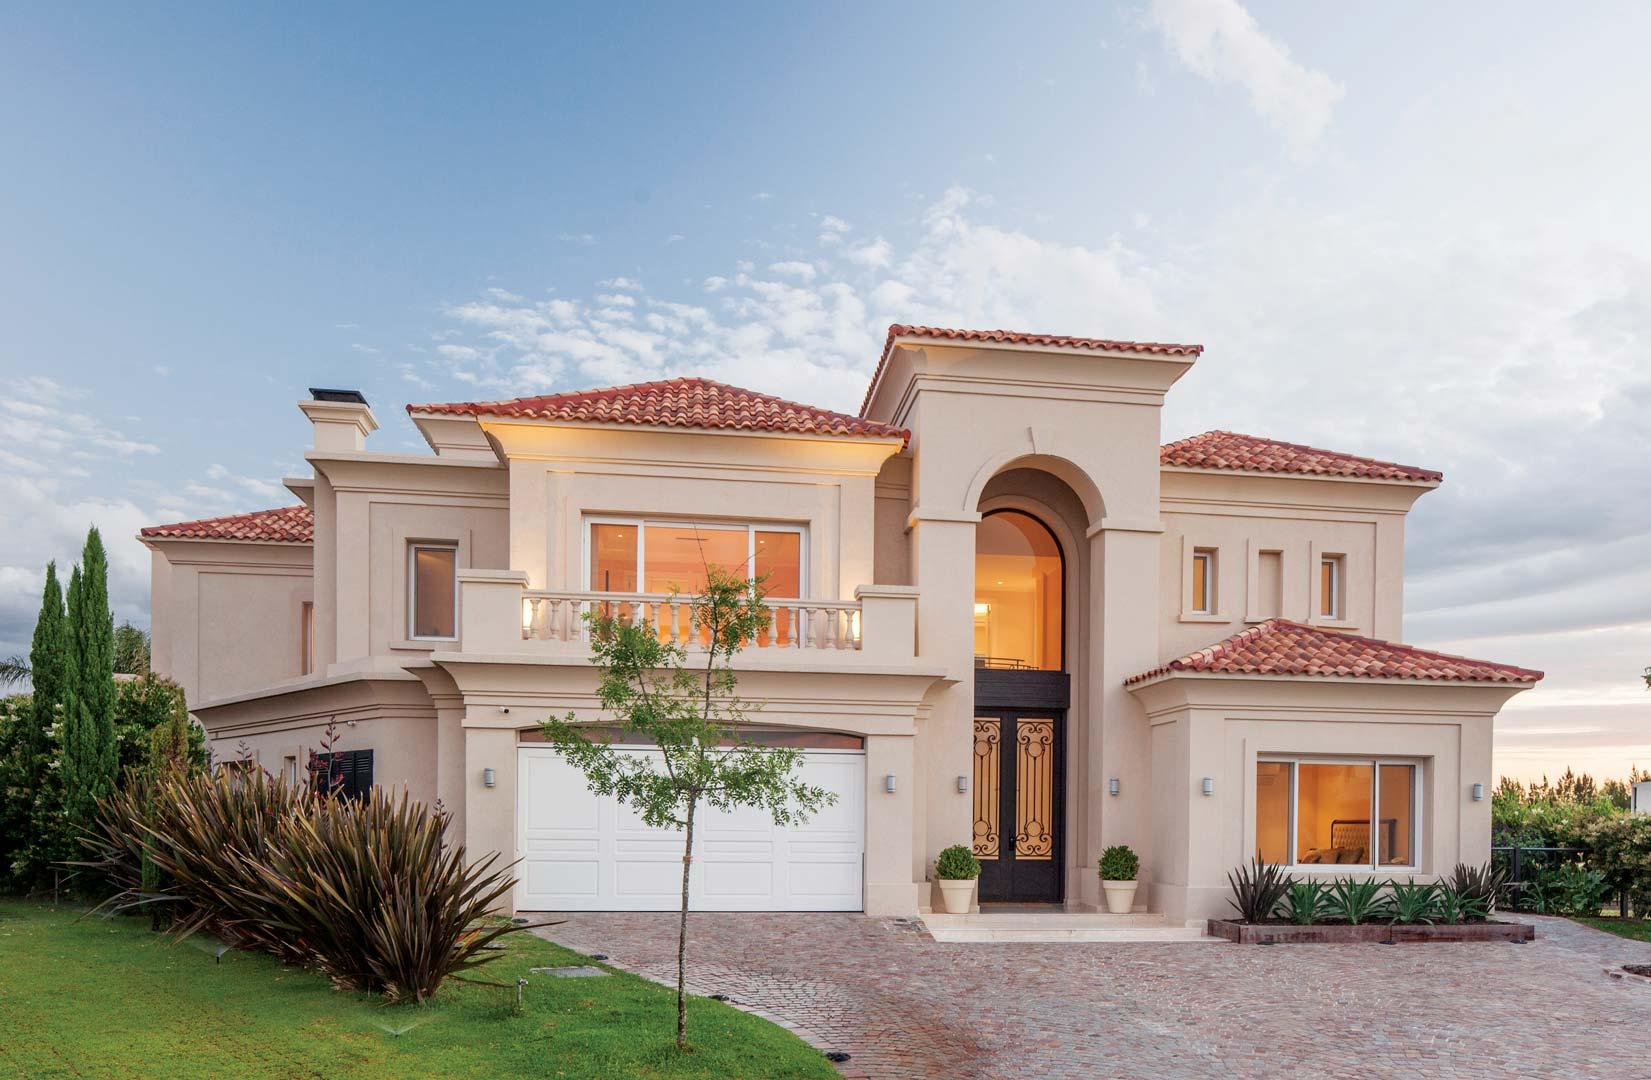 Apa arquitectura casa estilo italiano aggiornado for Fachadas de casas estilo clasico